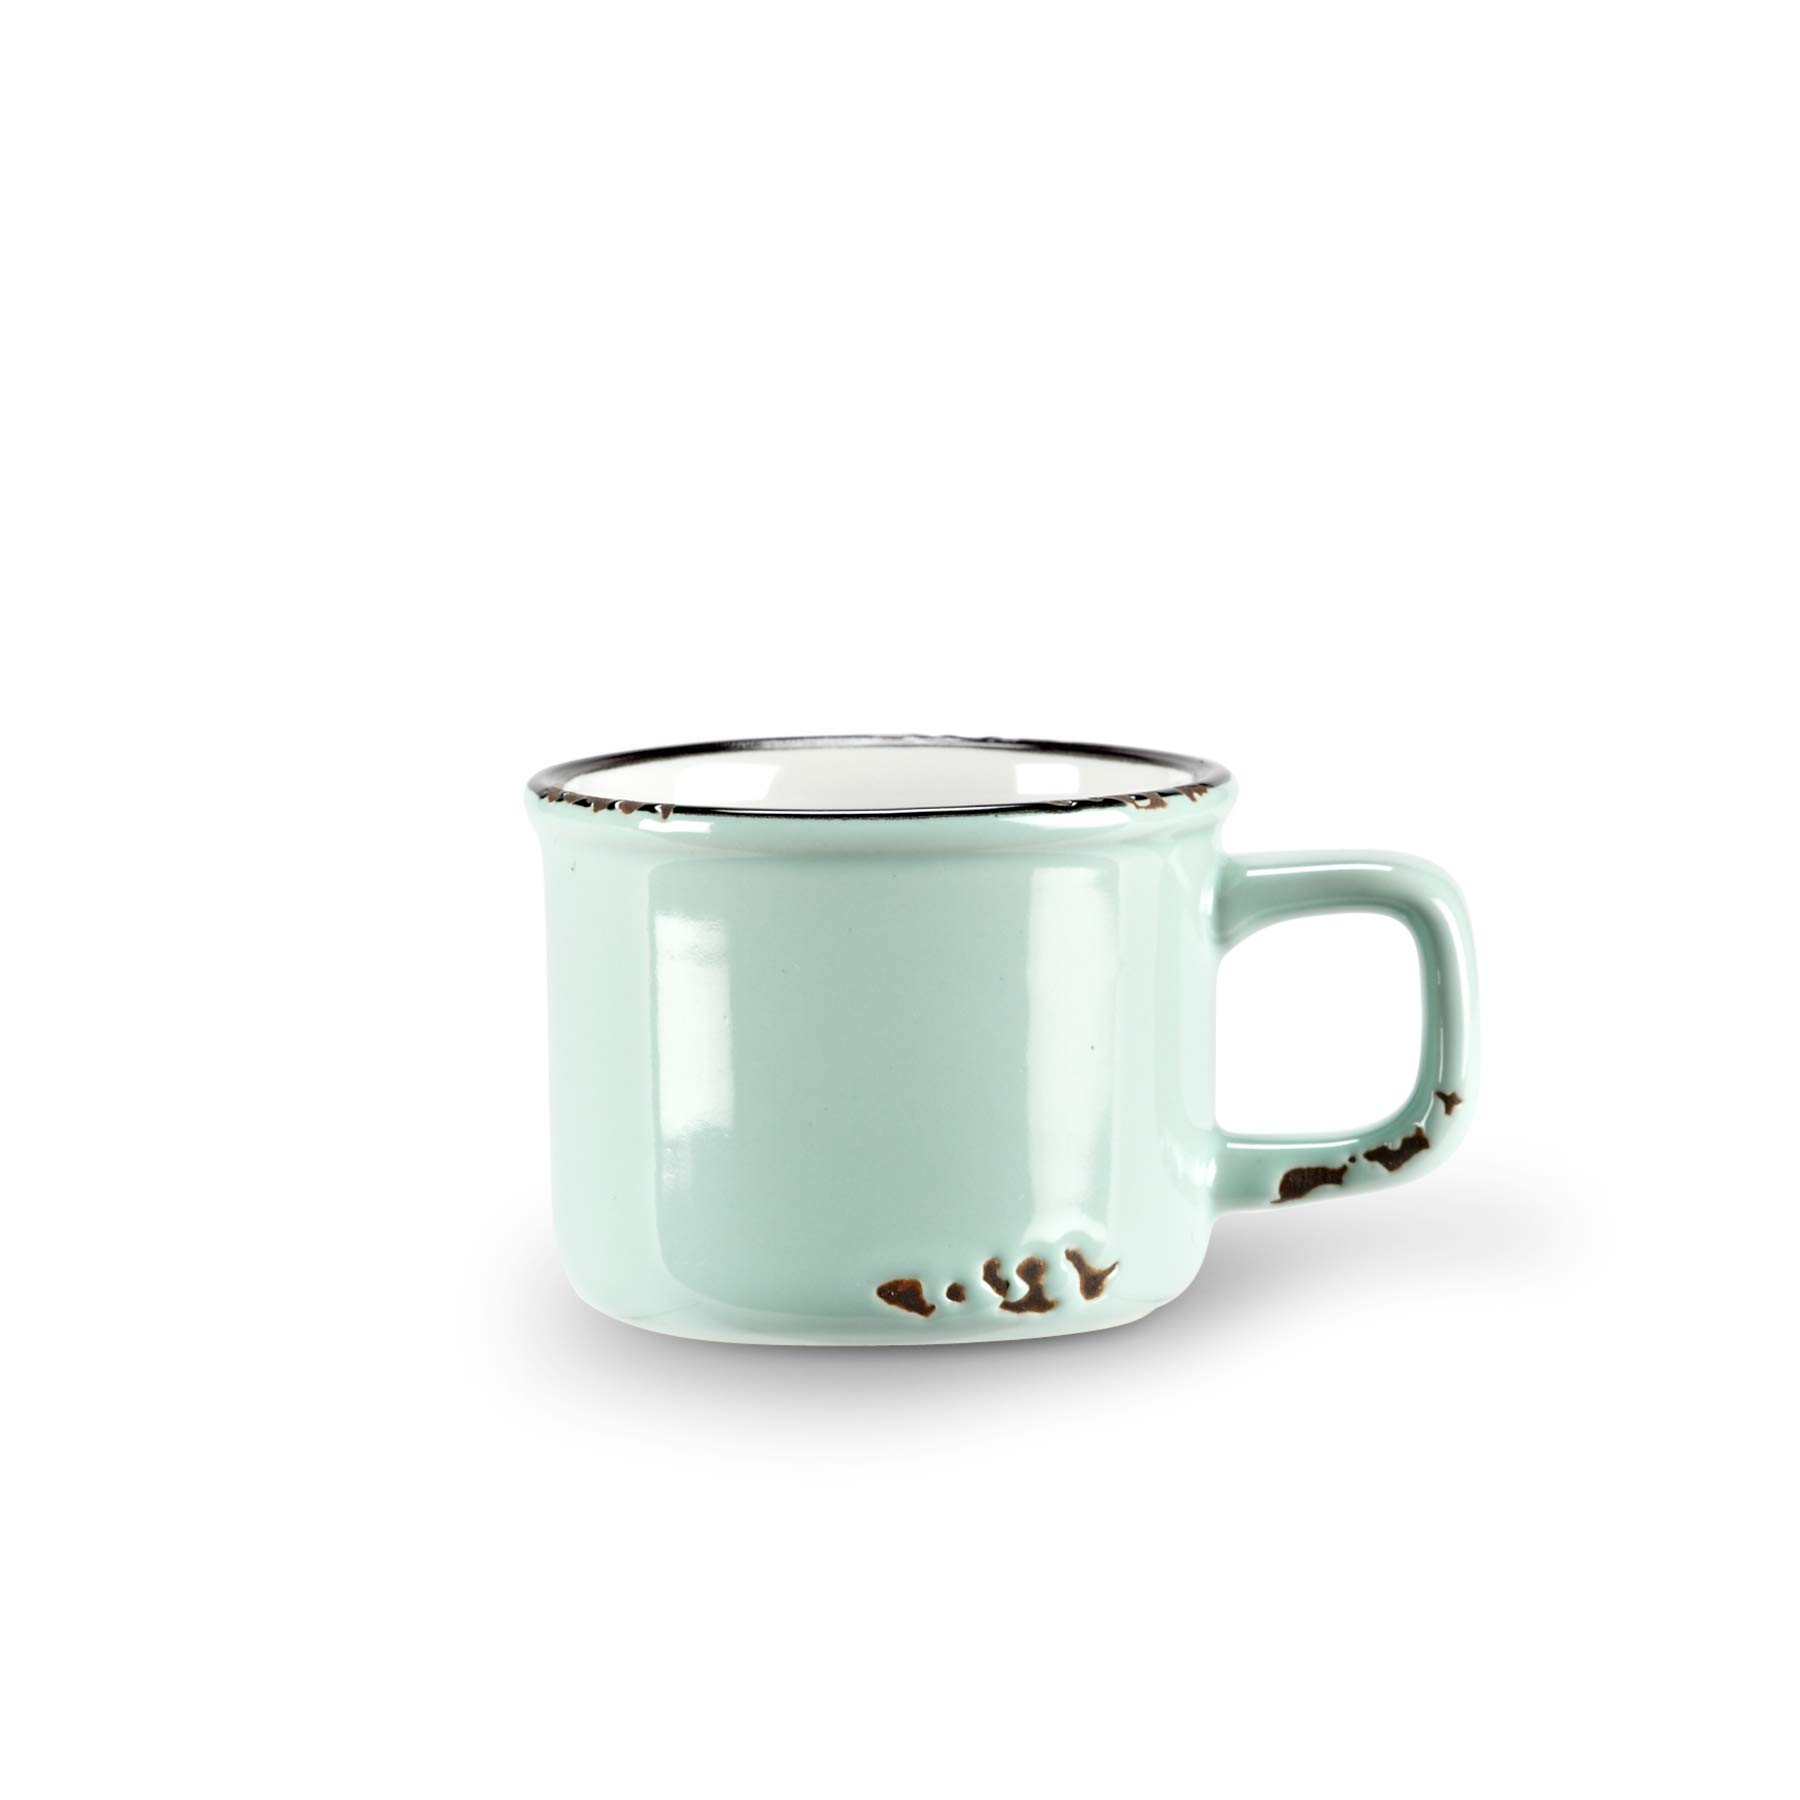 Abbott Collection Enamel Look Stoneware Espresso Cup, Green